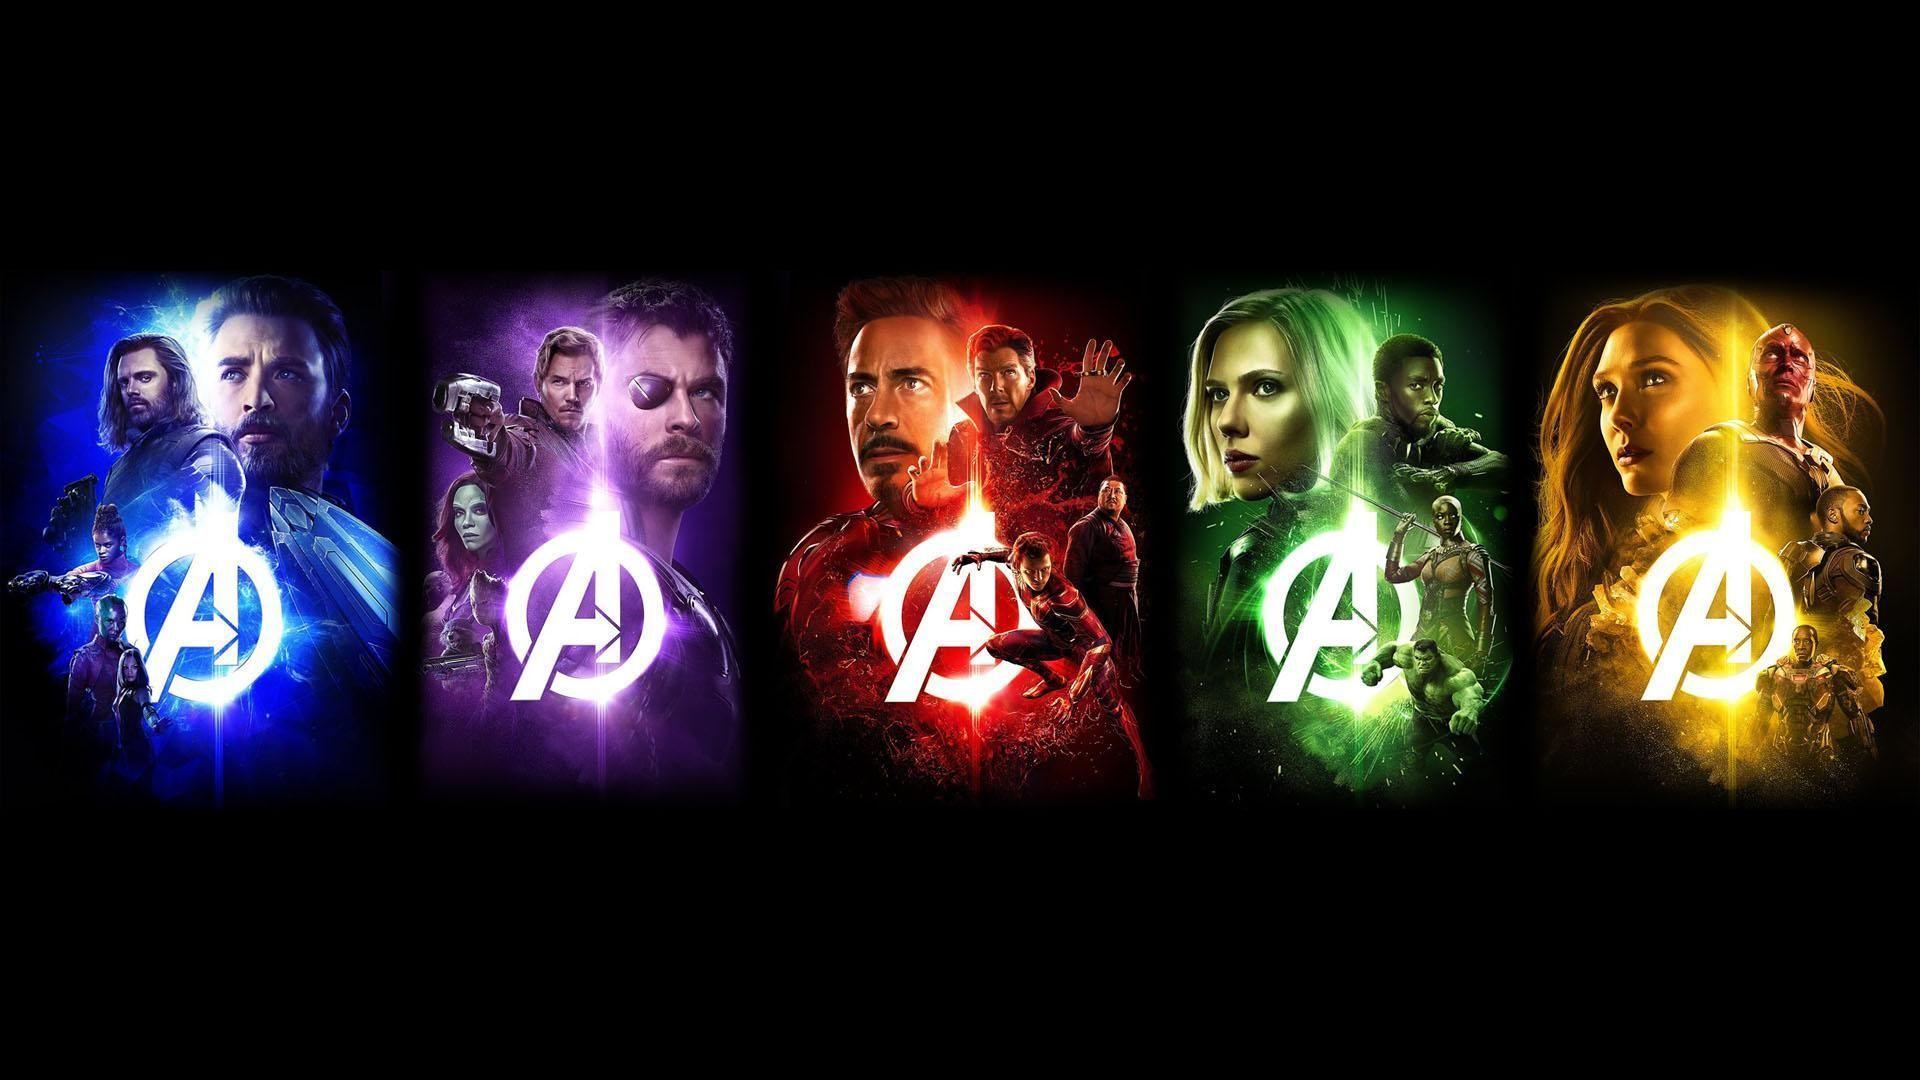 1920x1080 Avengers Infinity War Characters Desktop Wallpaper Best Hd